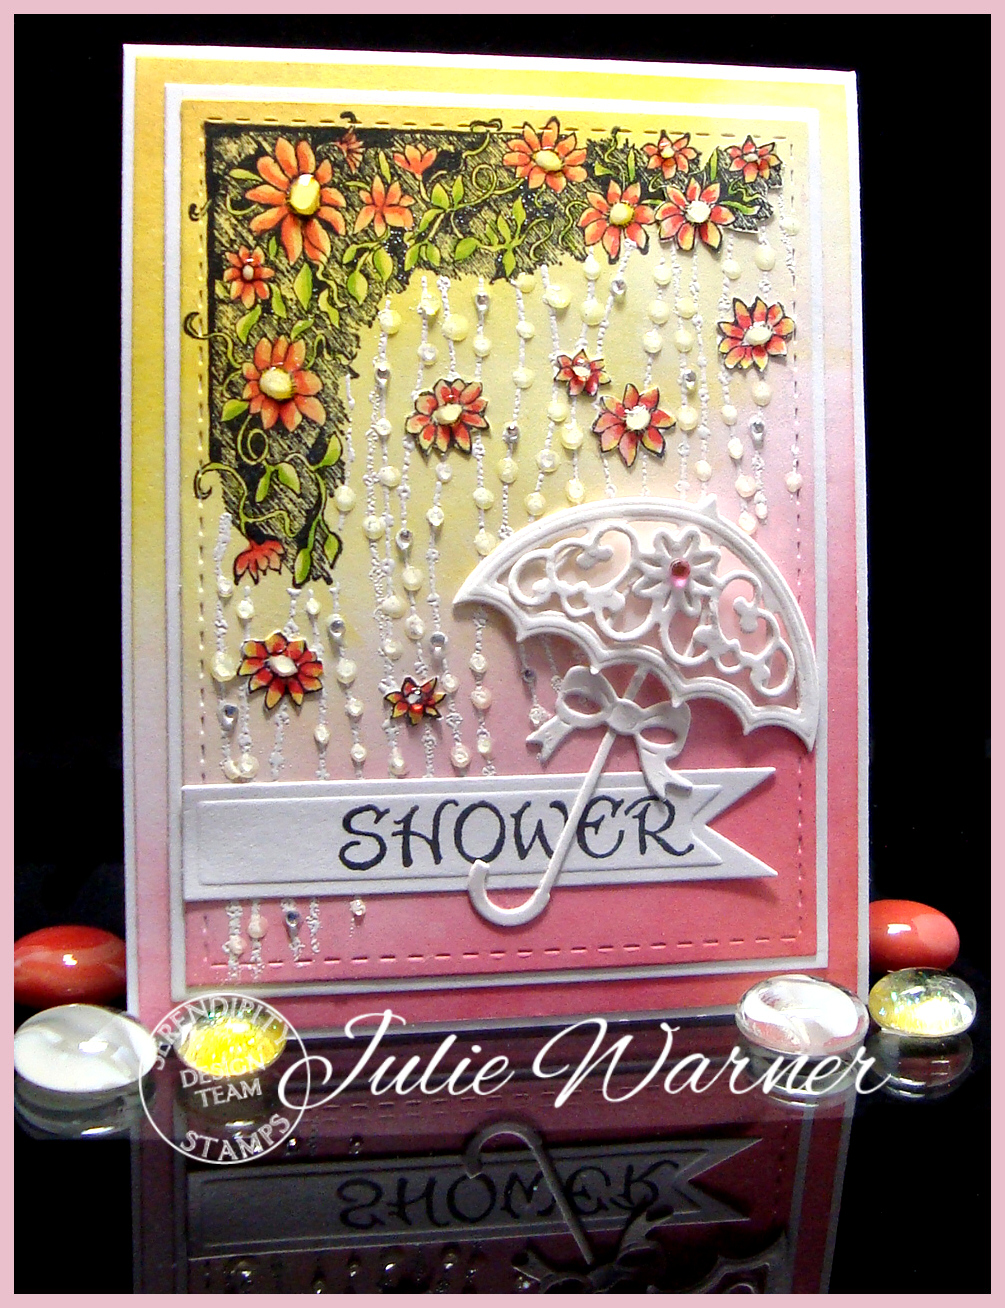 Shower 05915